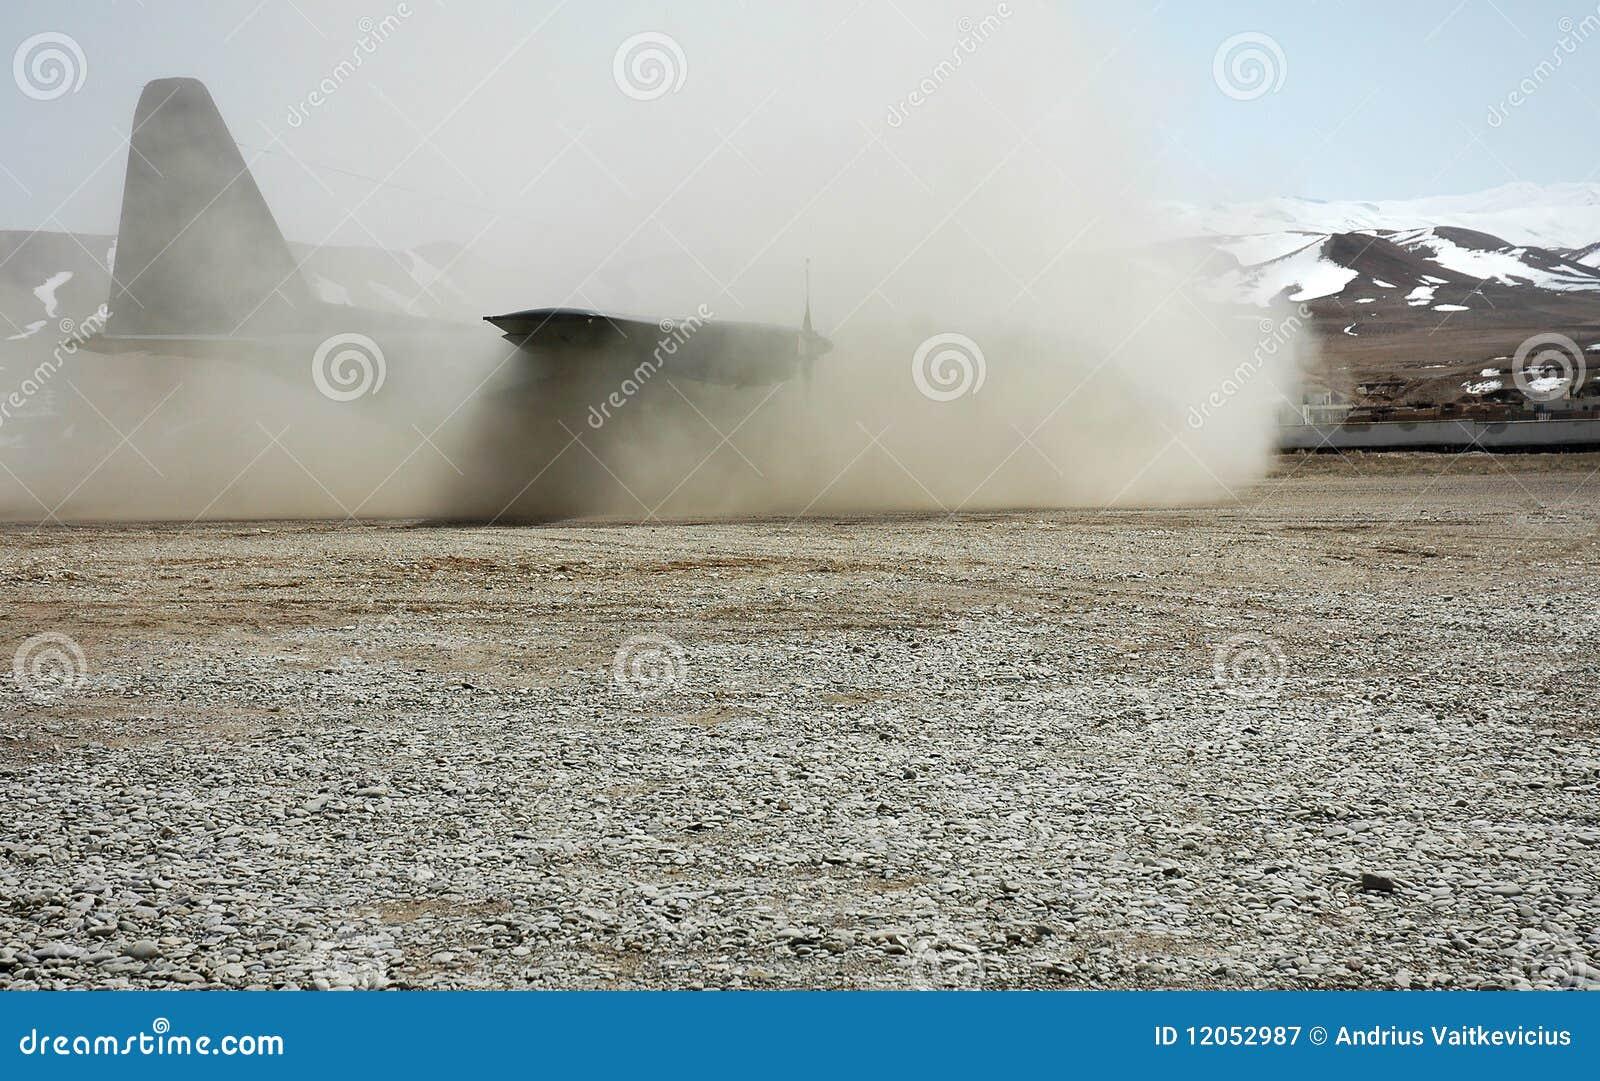 Atterrissage en Afghanistan